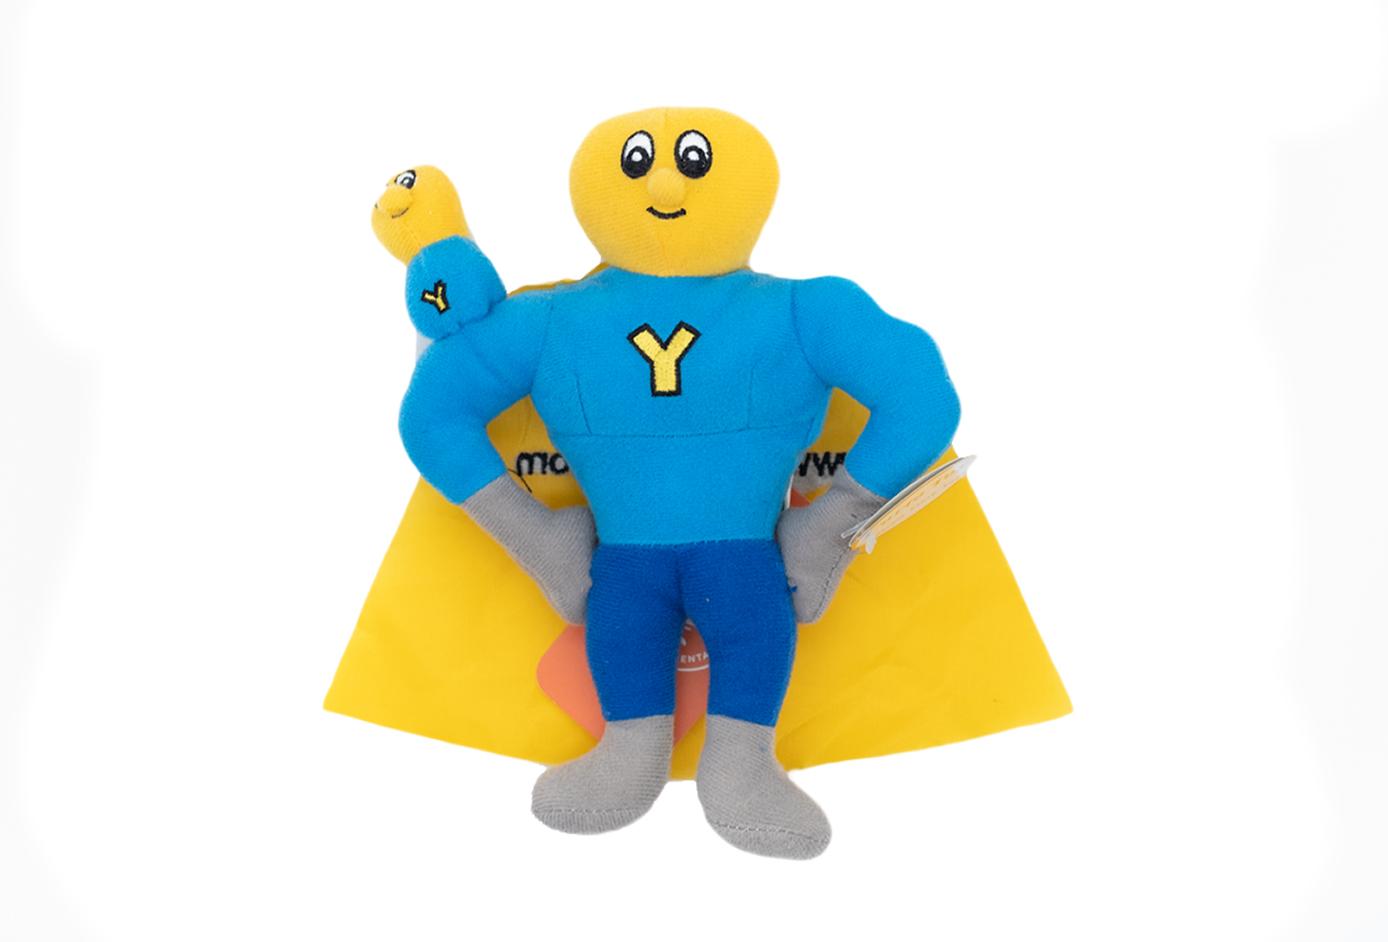 Yeastman Doll